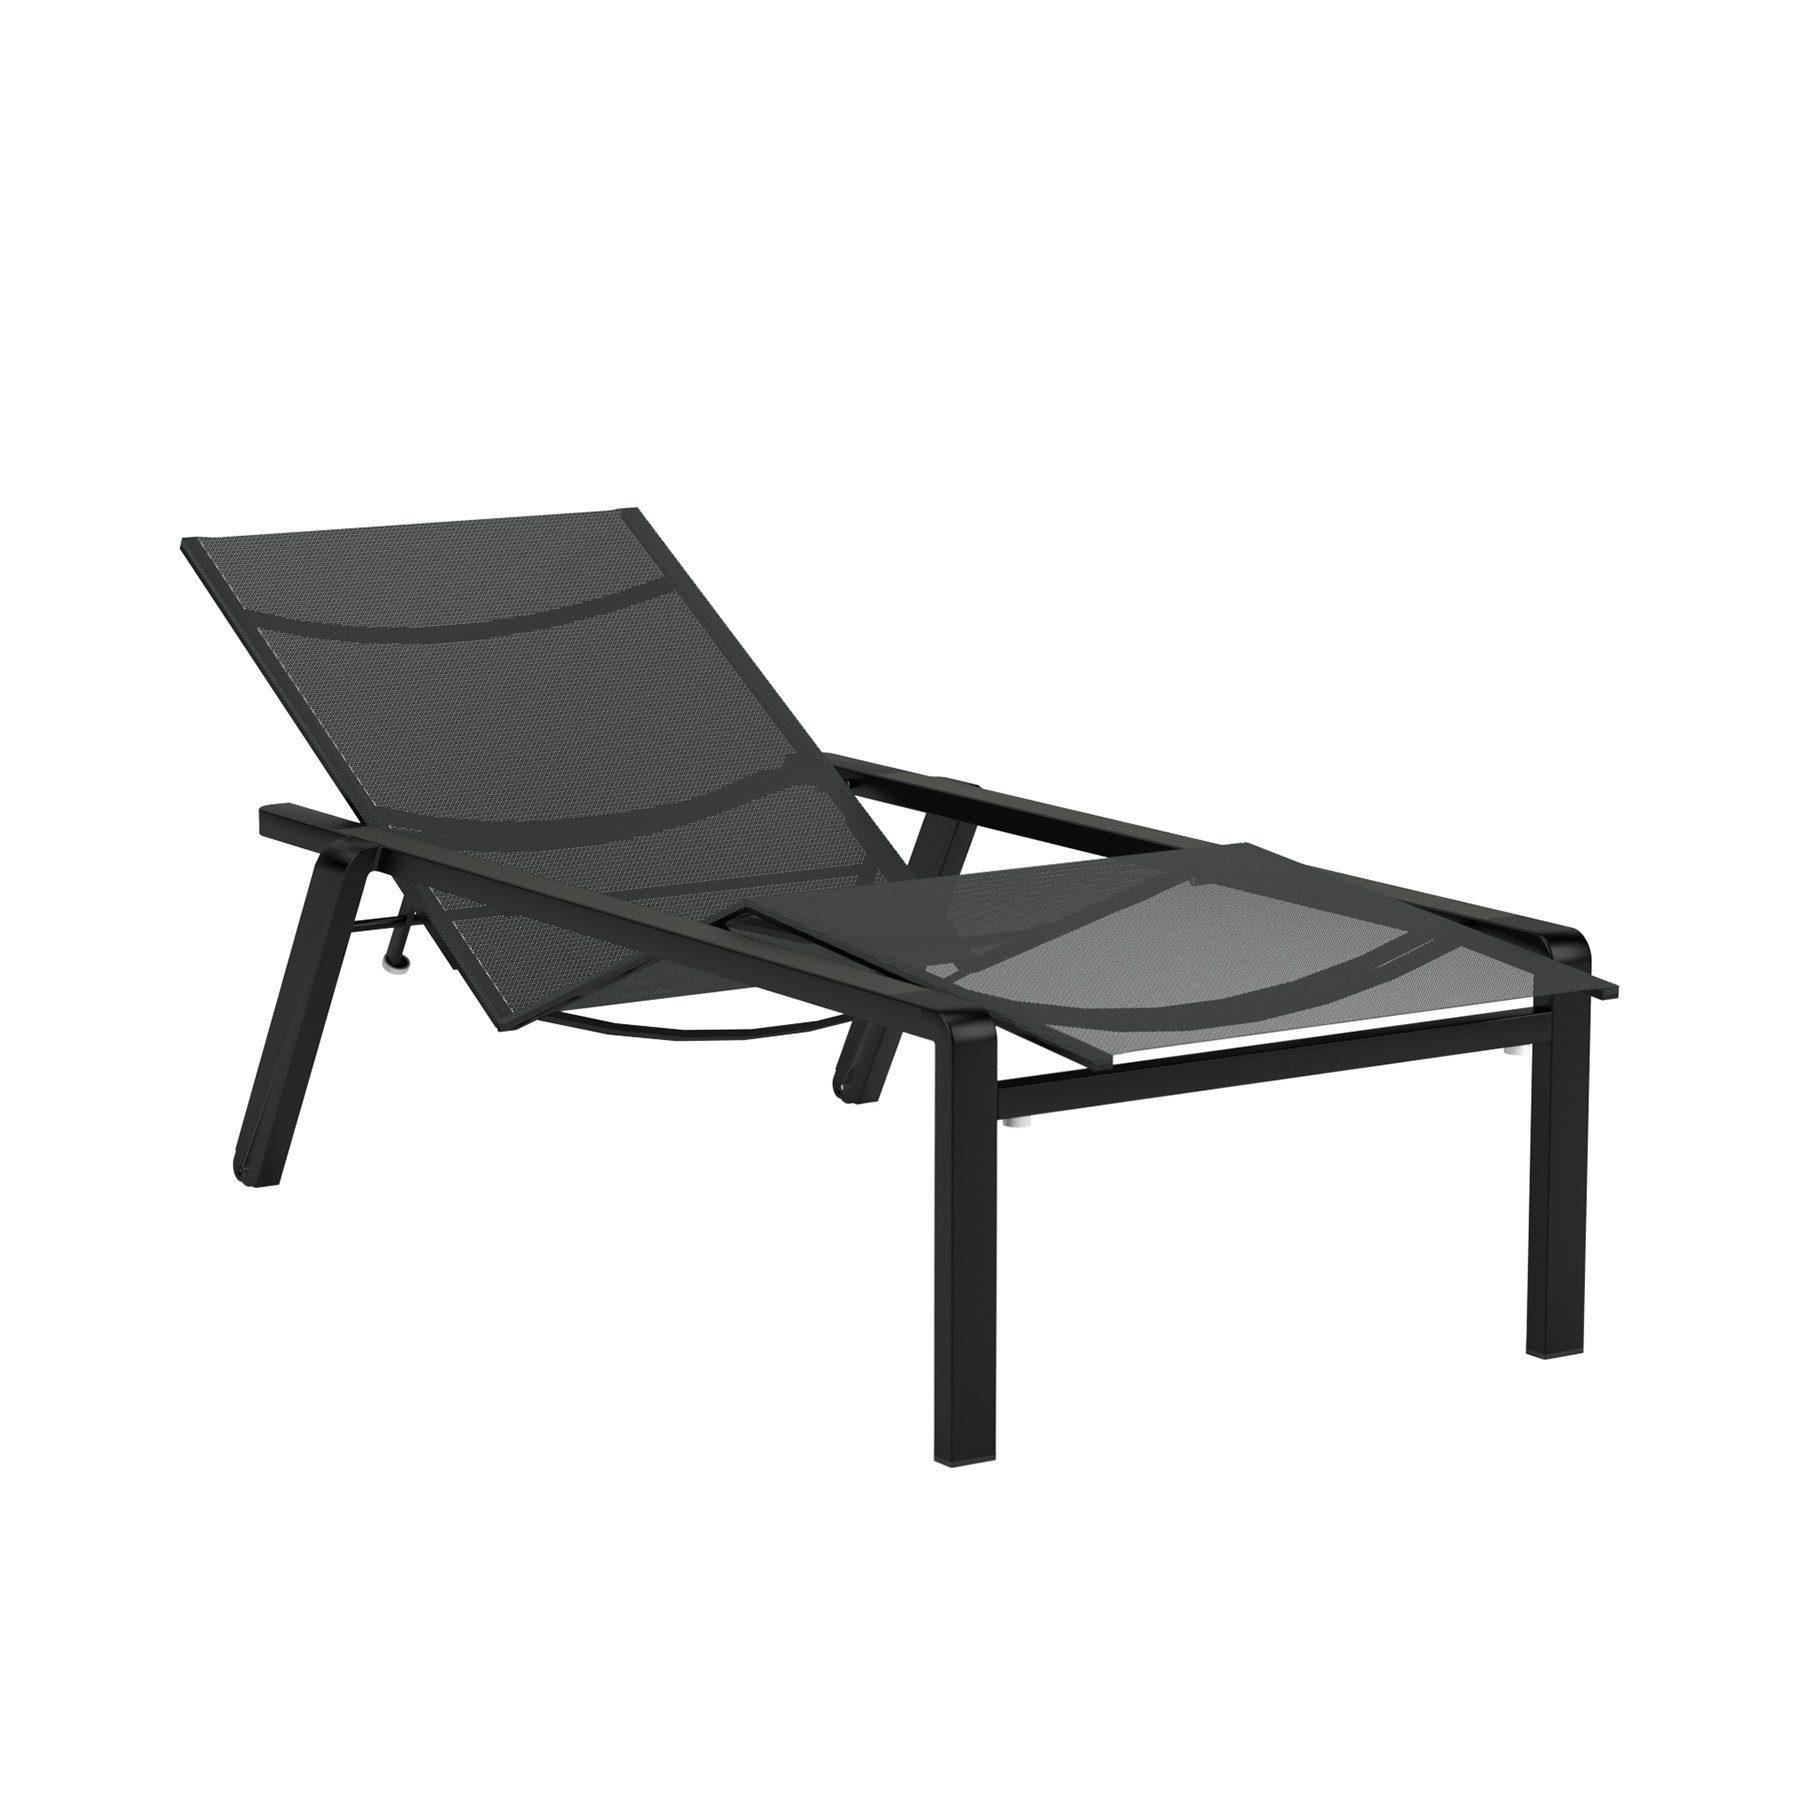 royal botania alura sonnenliege. Black Bedroom Furniture Sets. Home Design Ideas